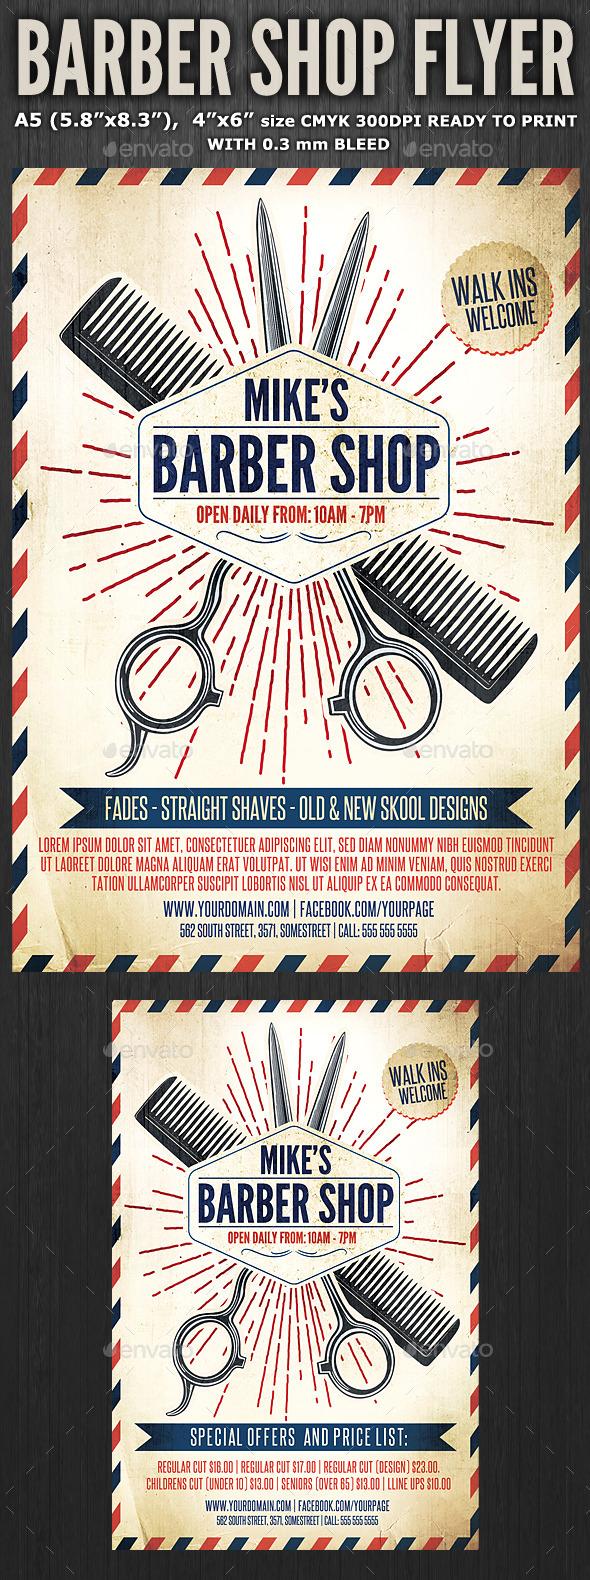 Barber Shop Flyer Graphics Designs Templates Page 2